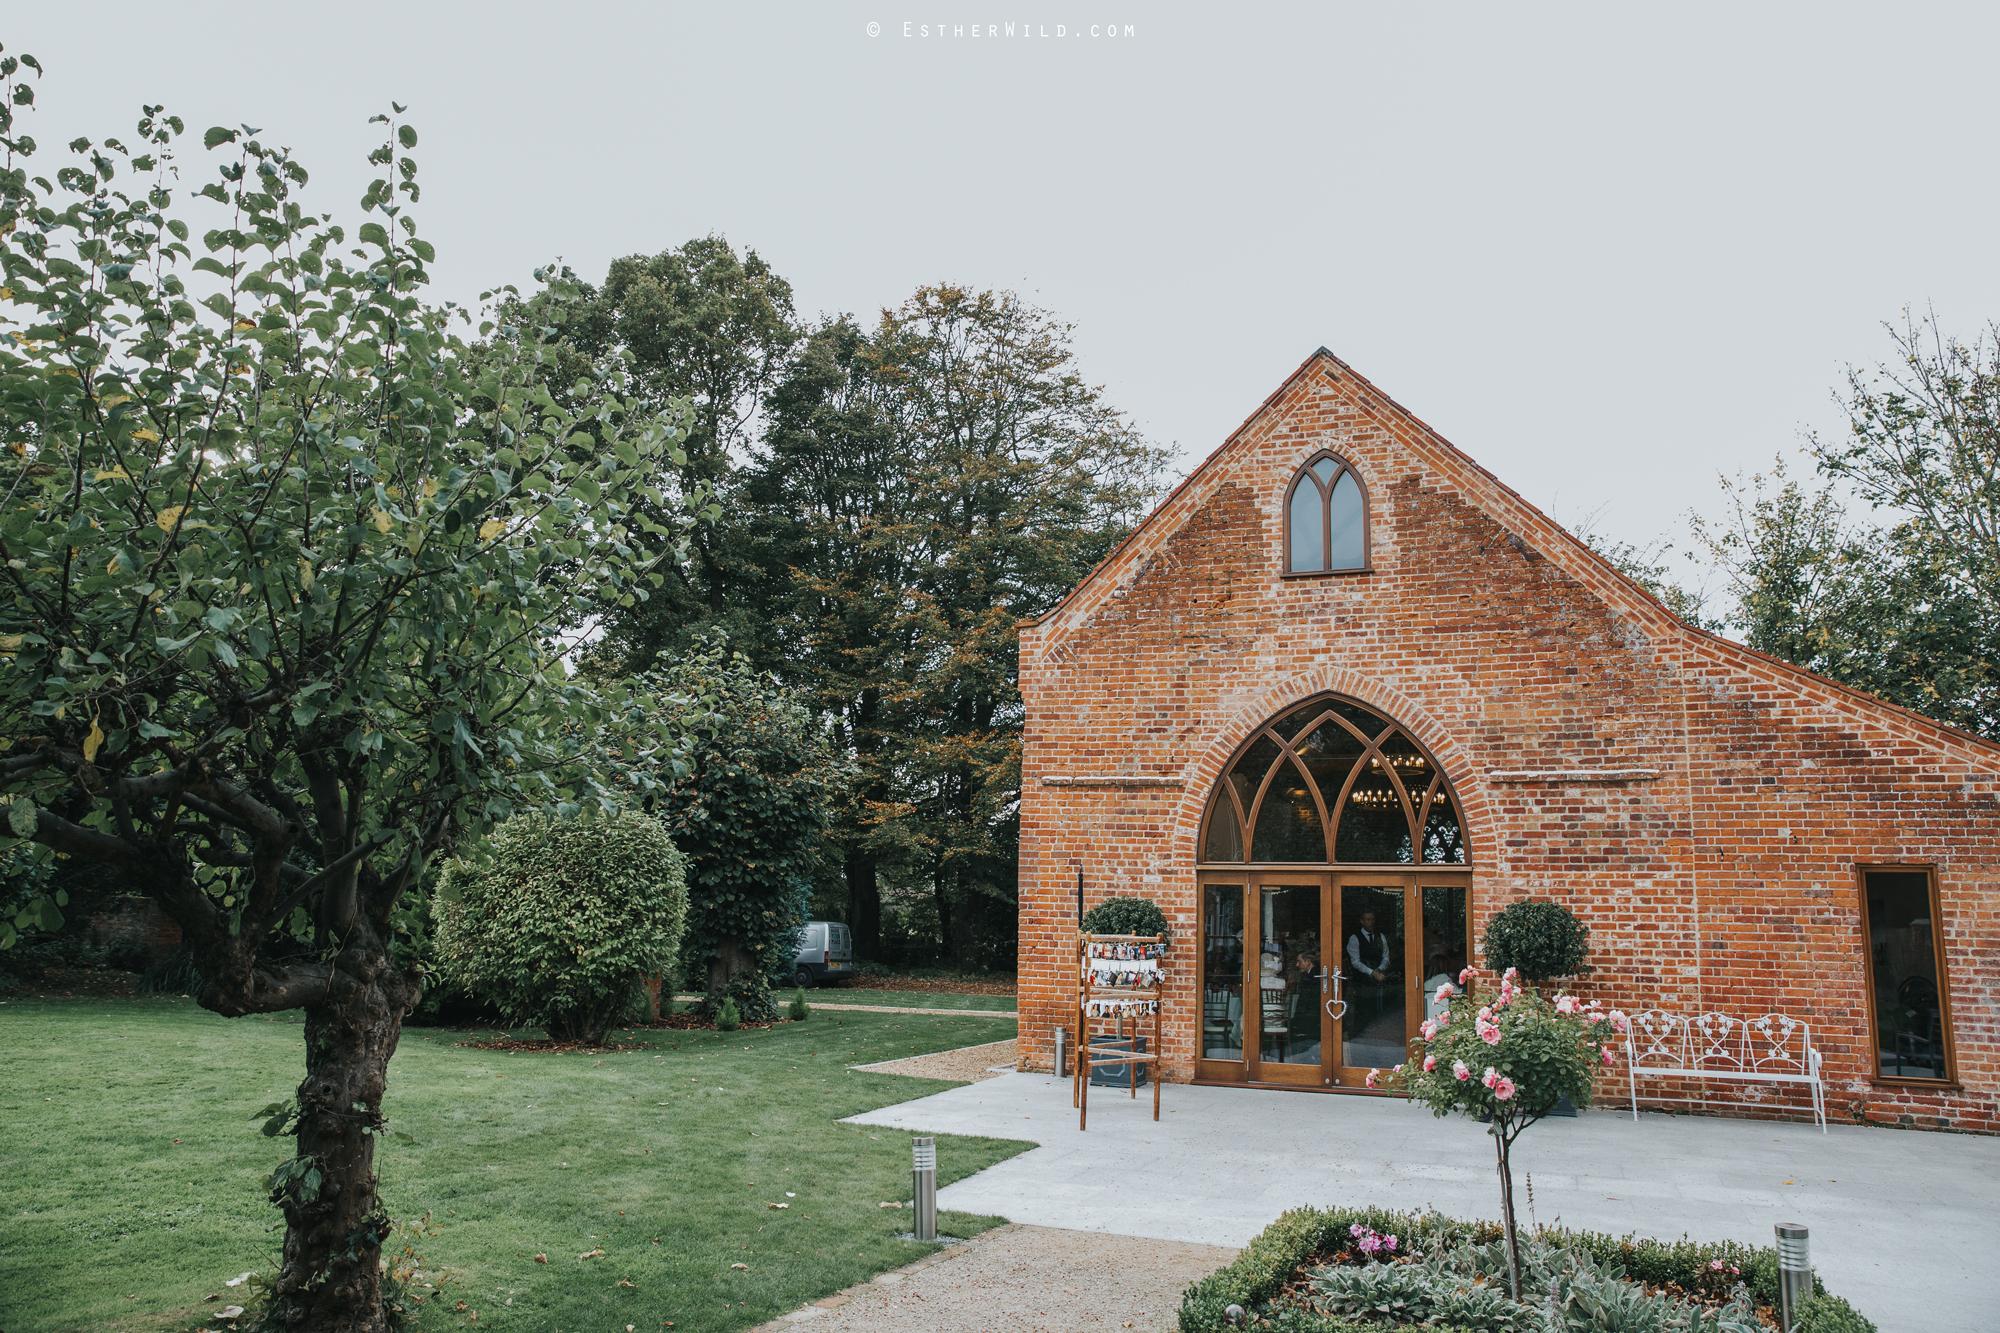 Reading_Room_Weddings_Alby_Norwich_Photographer_Esther_Wild_IMG_2049.jpg